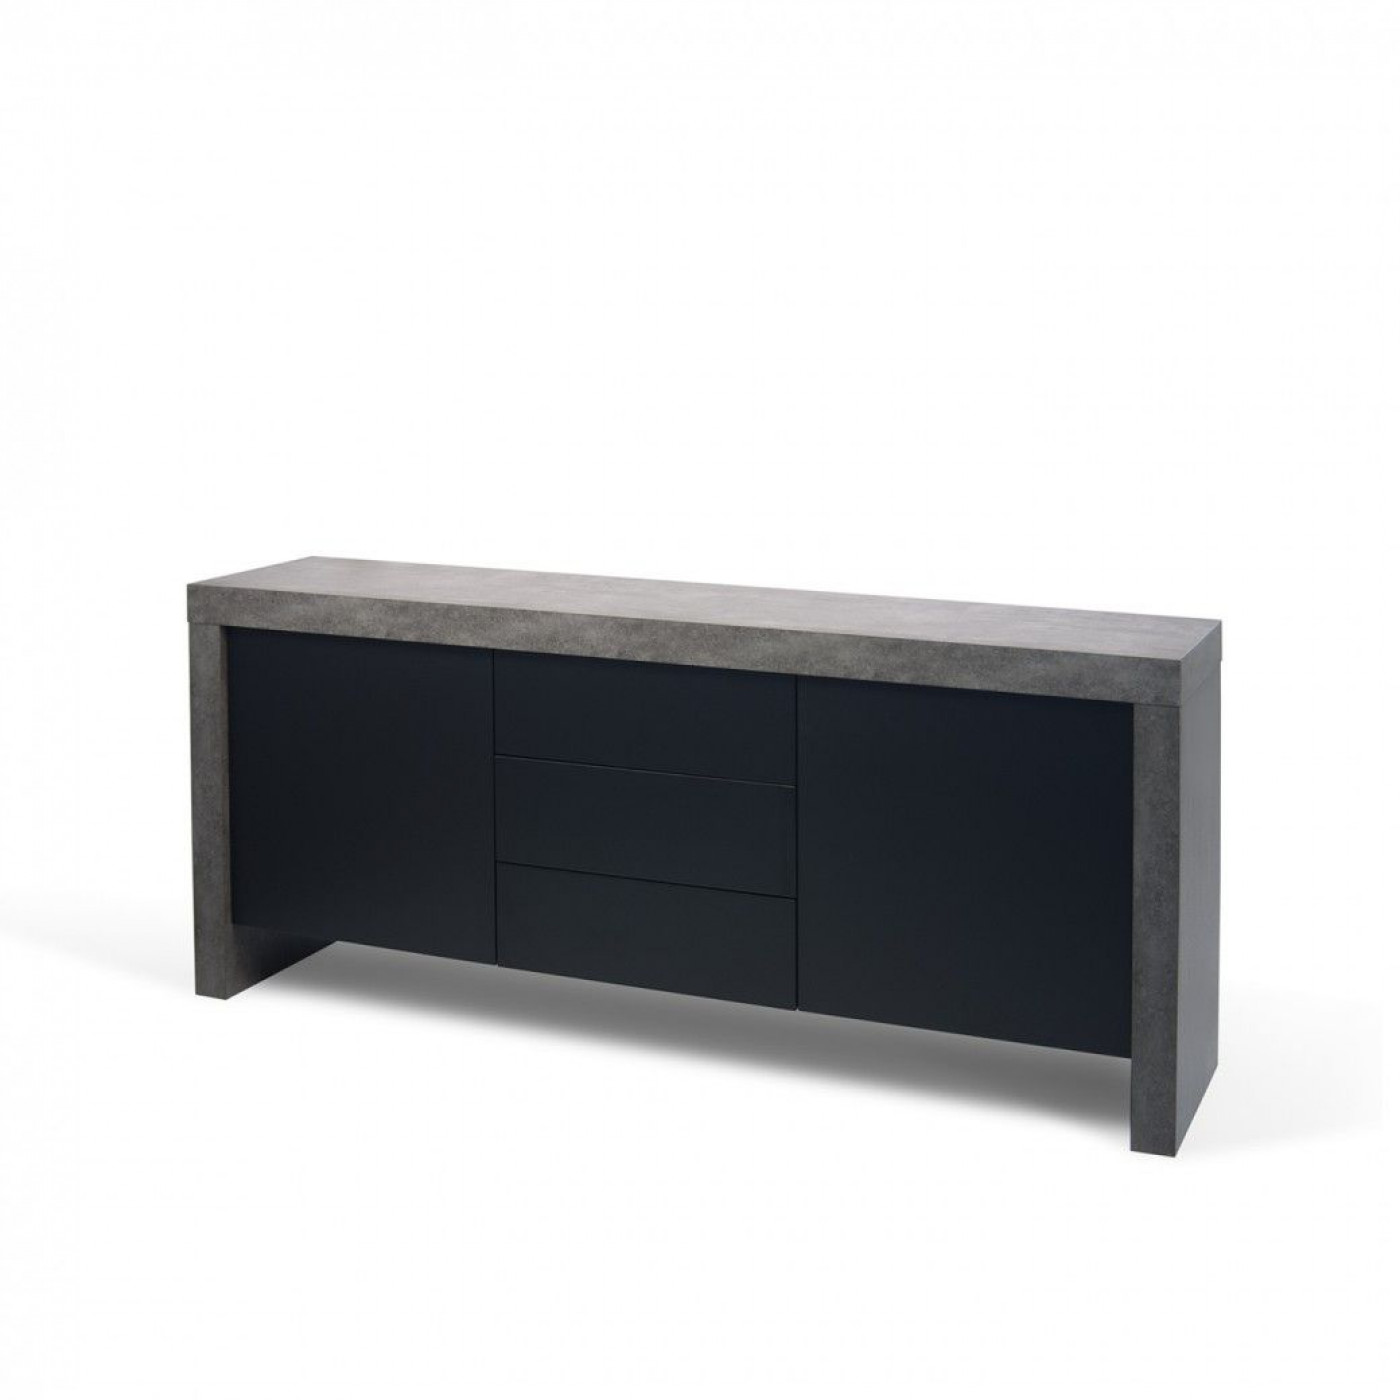 Kobe 3 Schubladen + 2 Türen | Beton